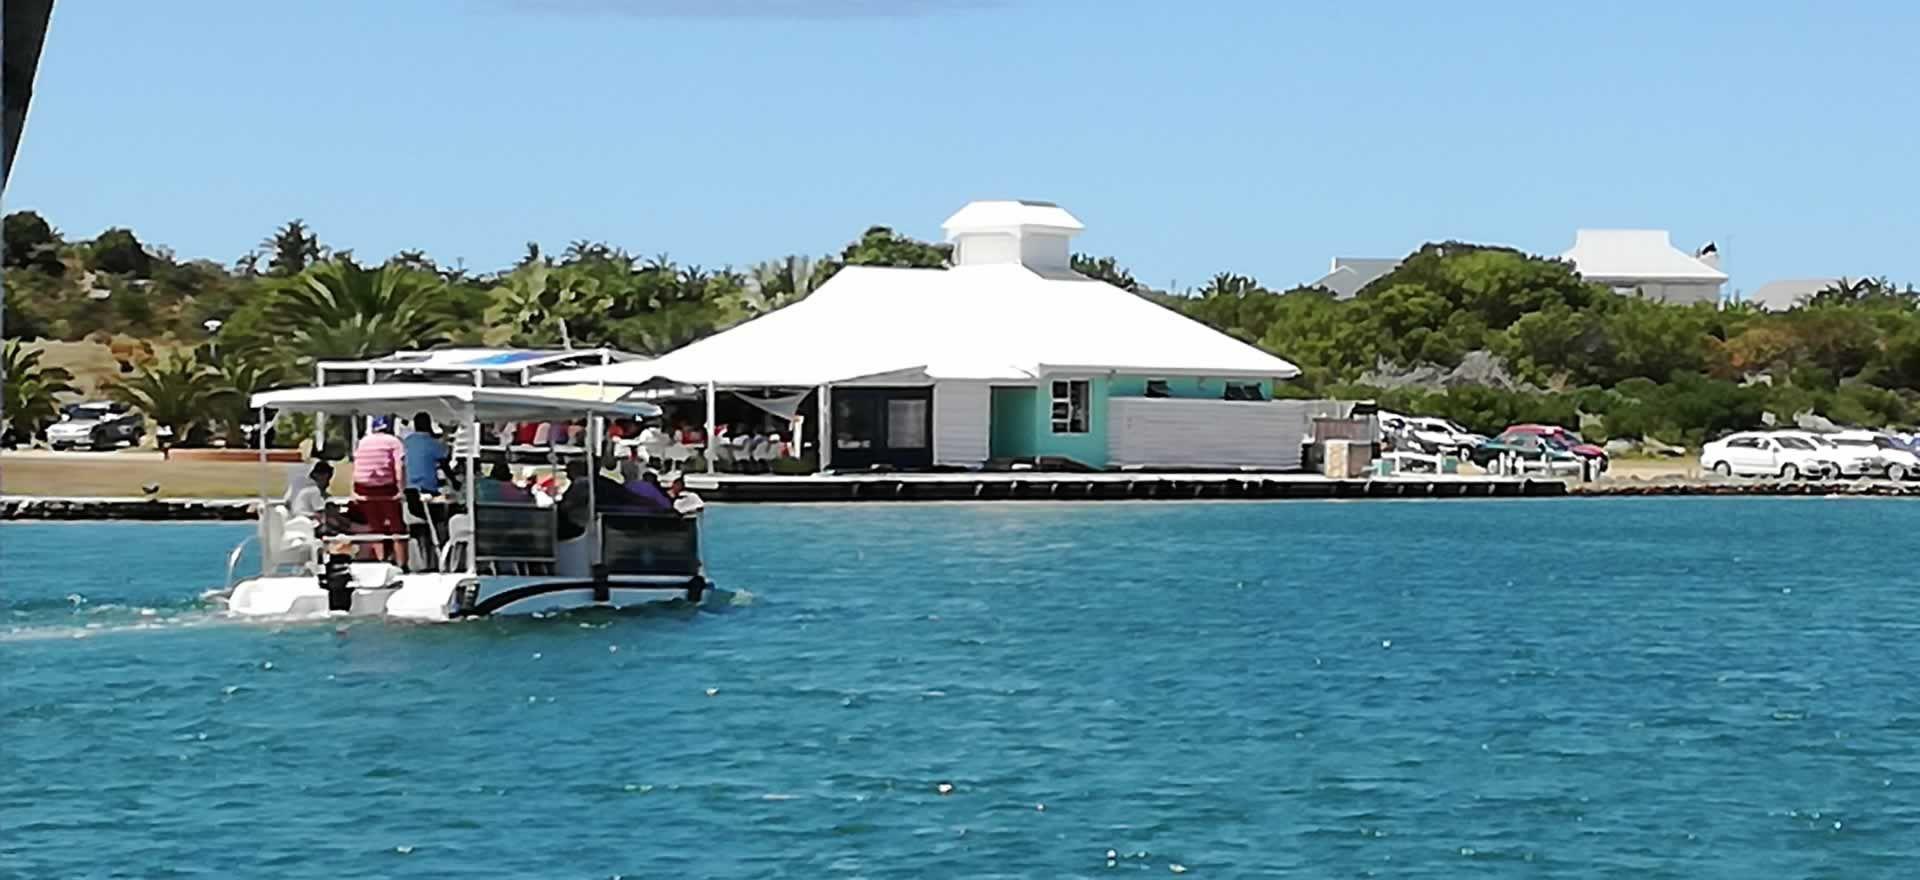 Marina Martinique & Jeffreys Bay <br>South Africa